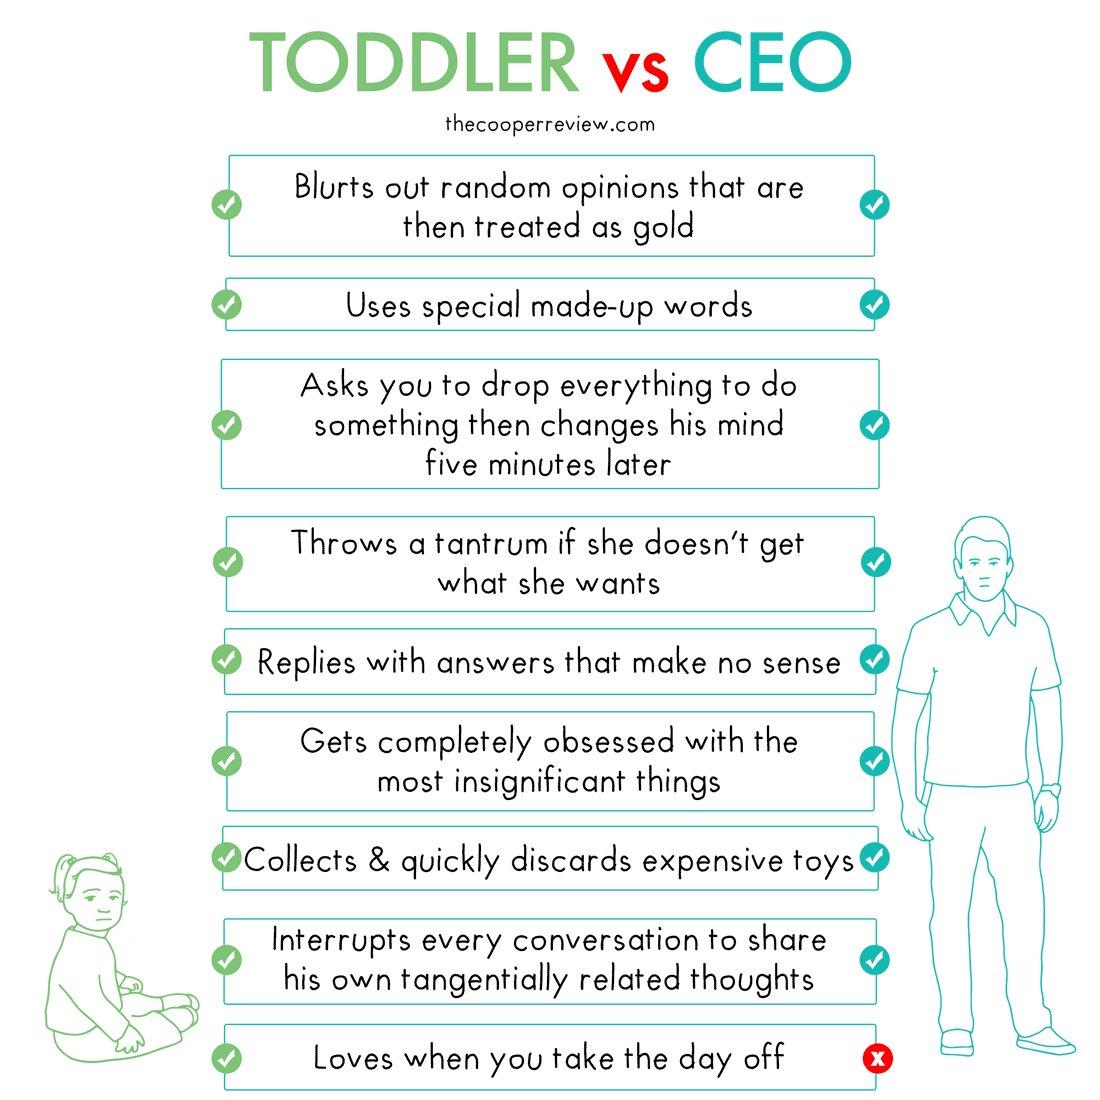 Toddler vs. CEO https://t.co/qT88Jz4OqN https://t.co/z6y2aFiITY